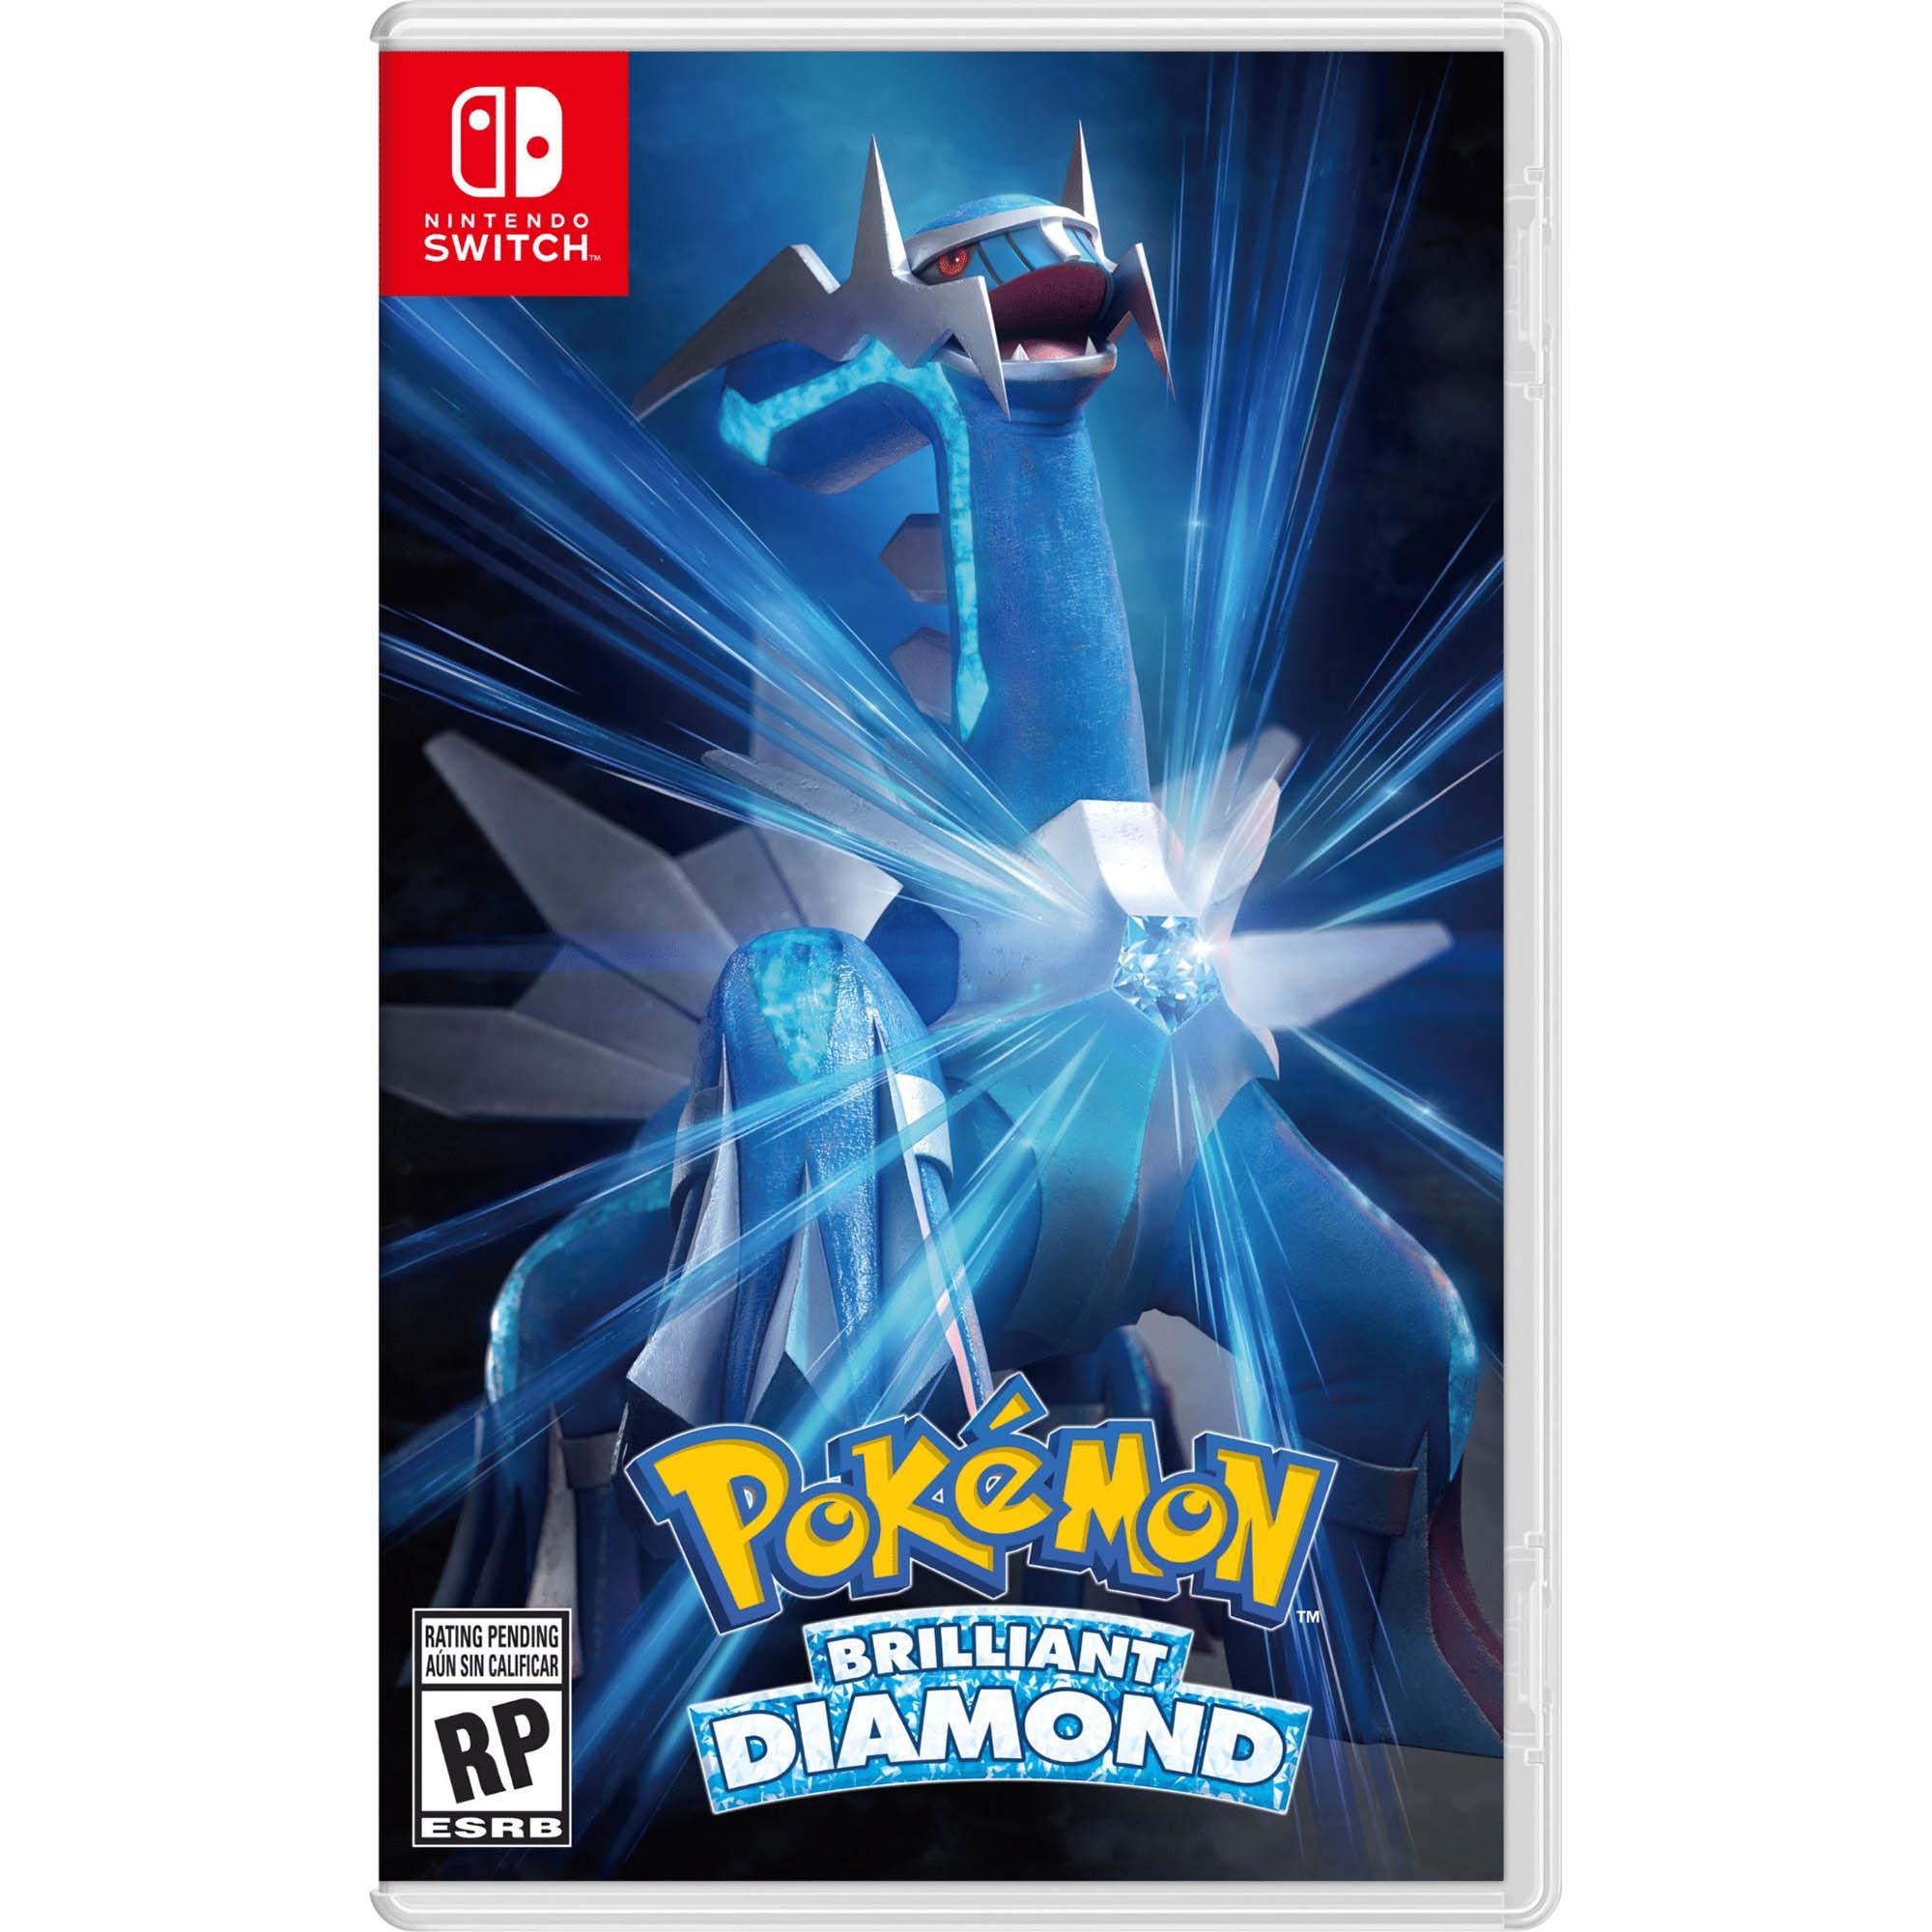 Pokémon: Brilliant Diamond - Nintendo Switch - Pré Venda - Mídia Fisica